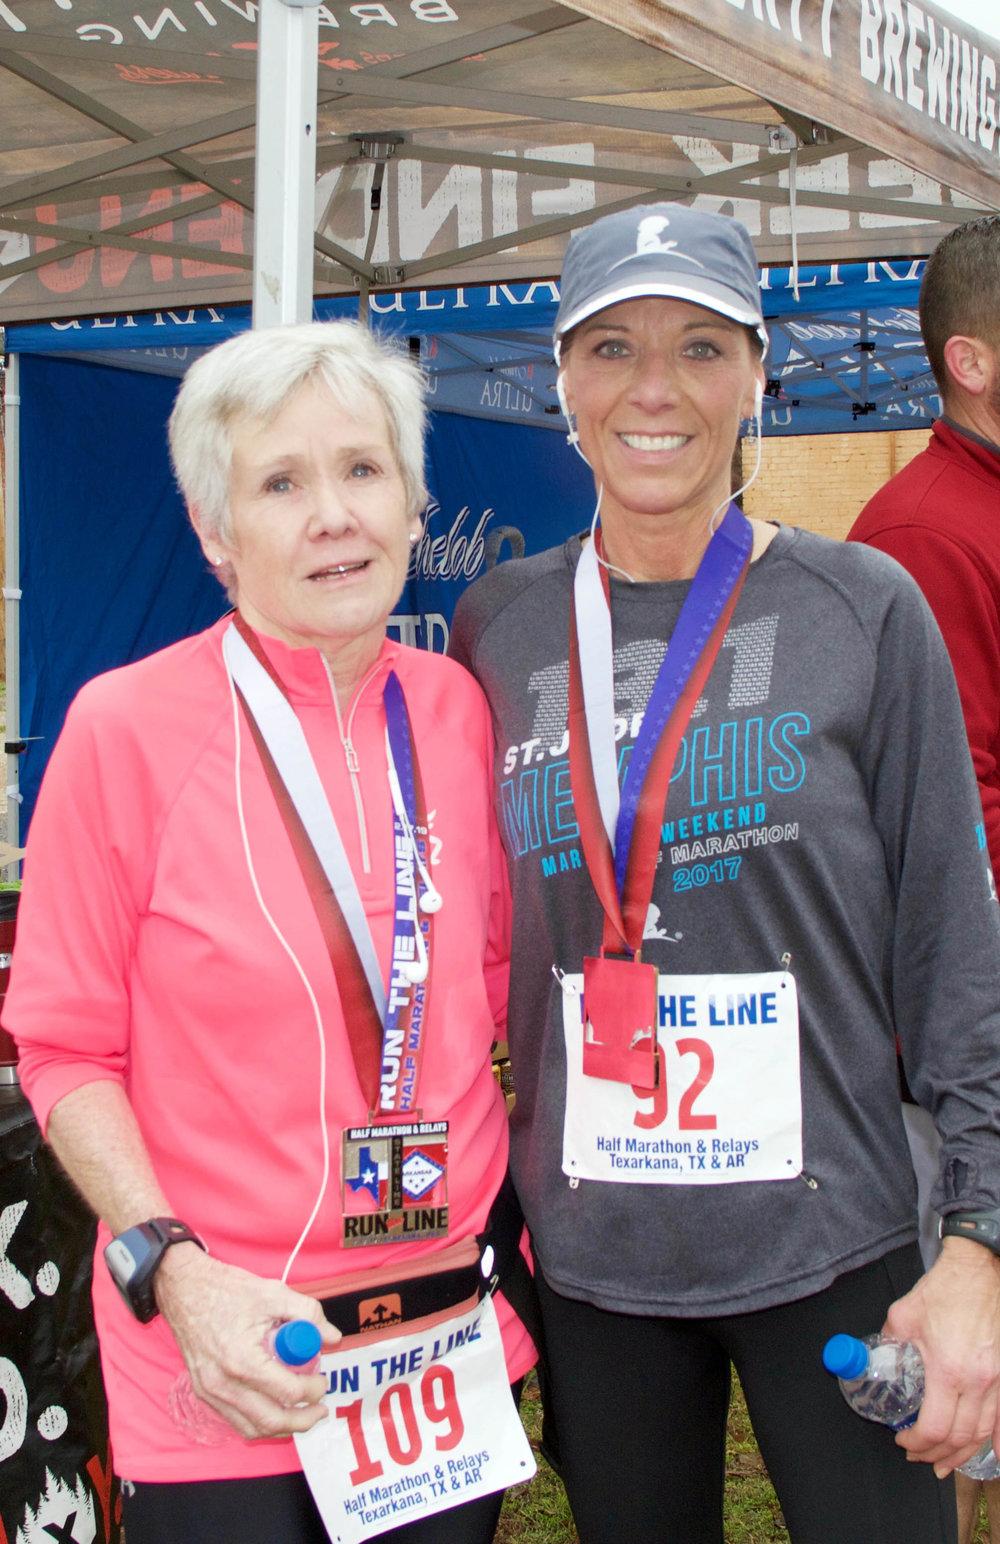 Kathy Stevens and Joyce Cates